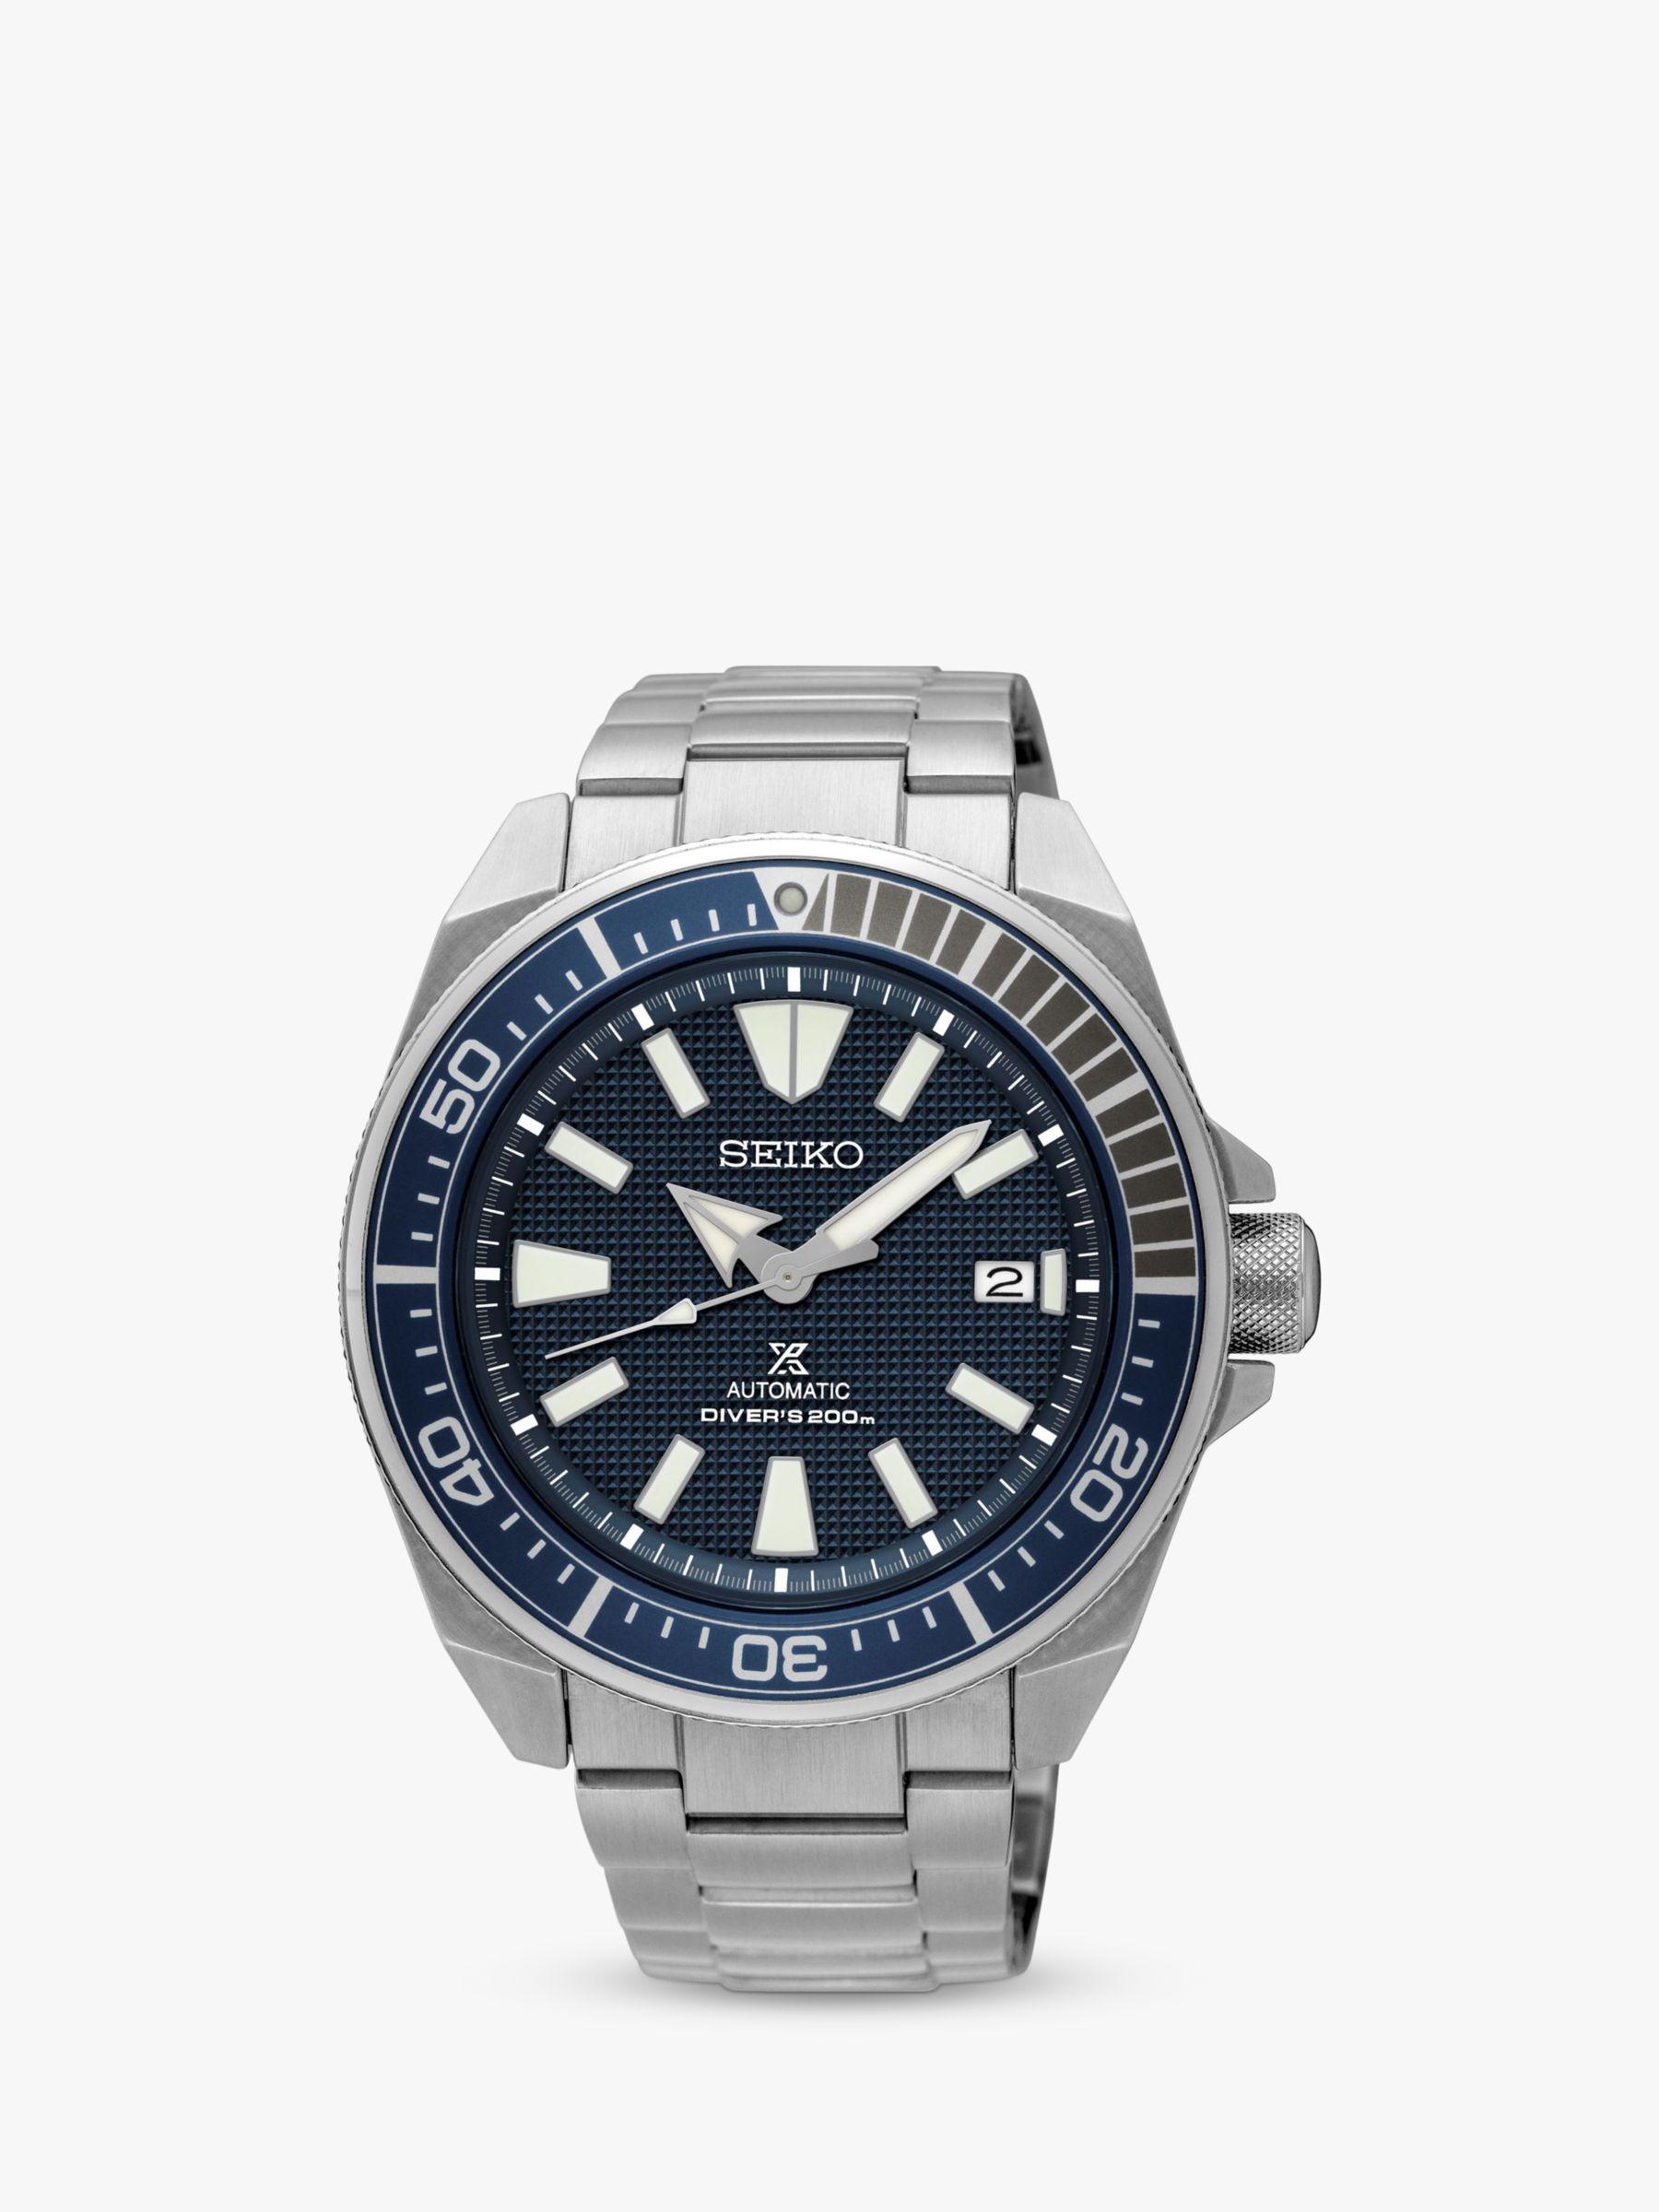 Seiko Seiko Men's Prospex Samurai Tuna Automatic Bracelet Strap Watch